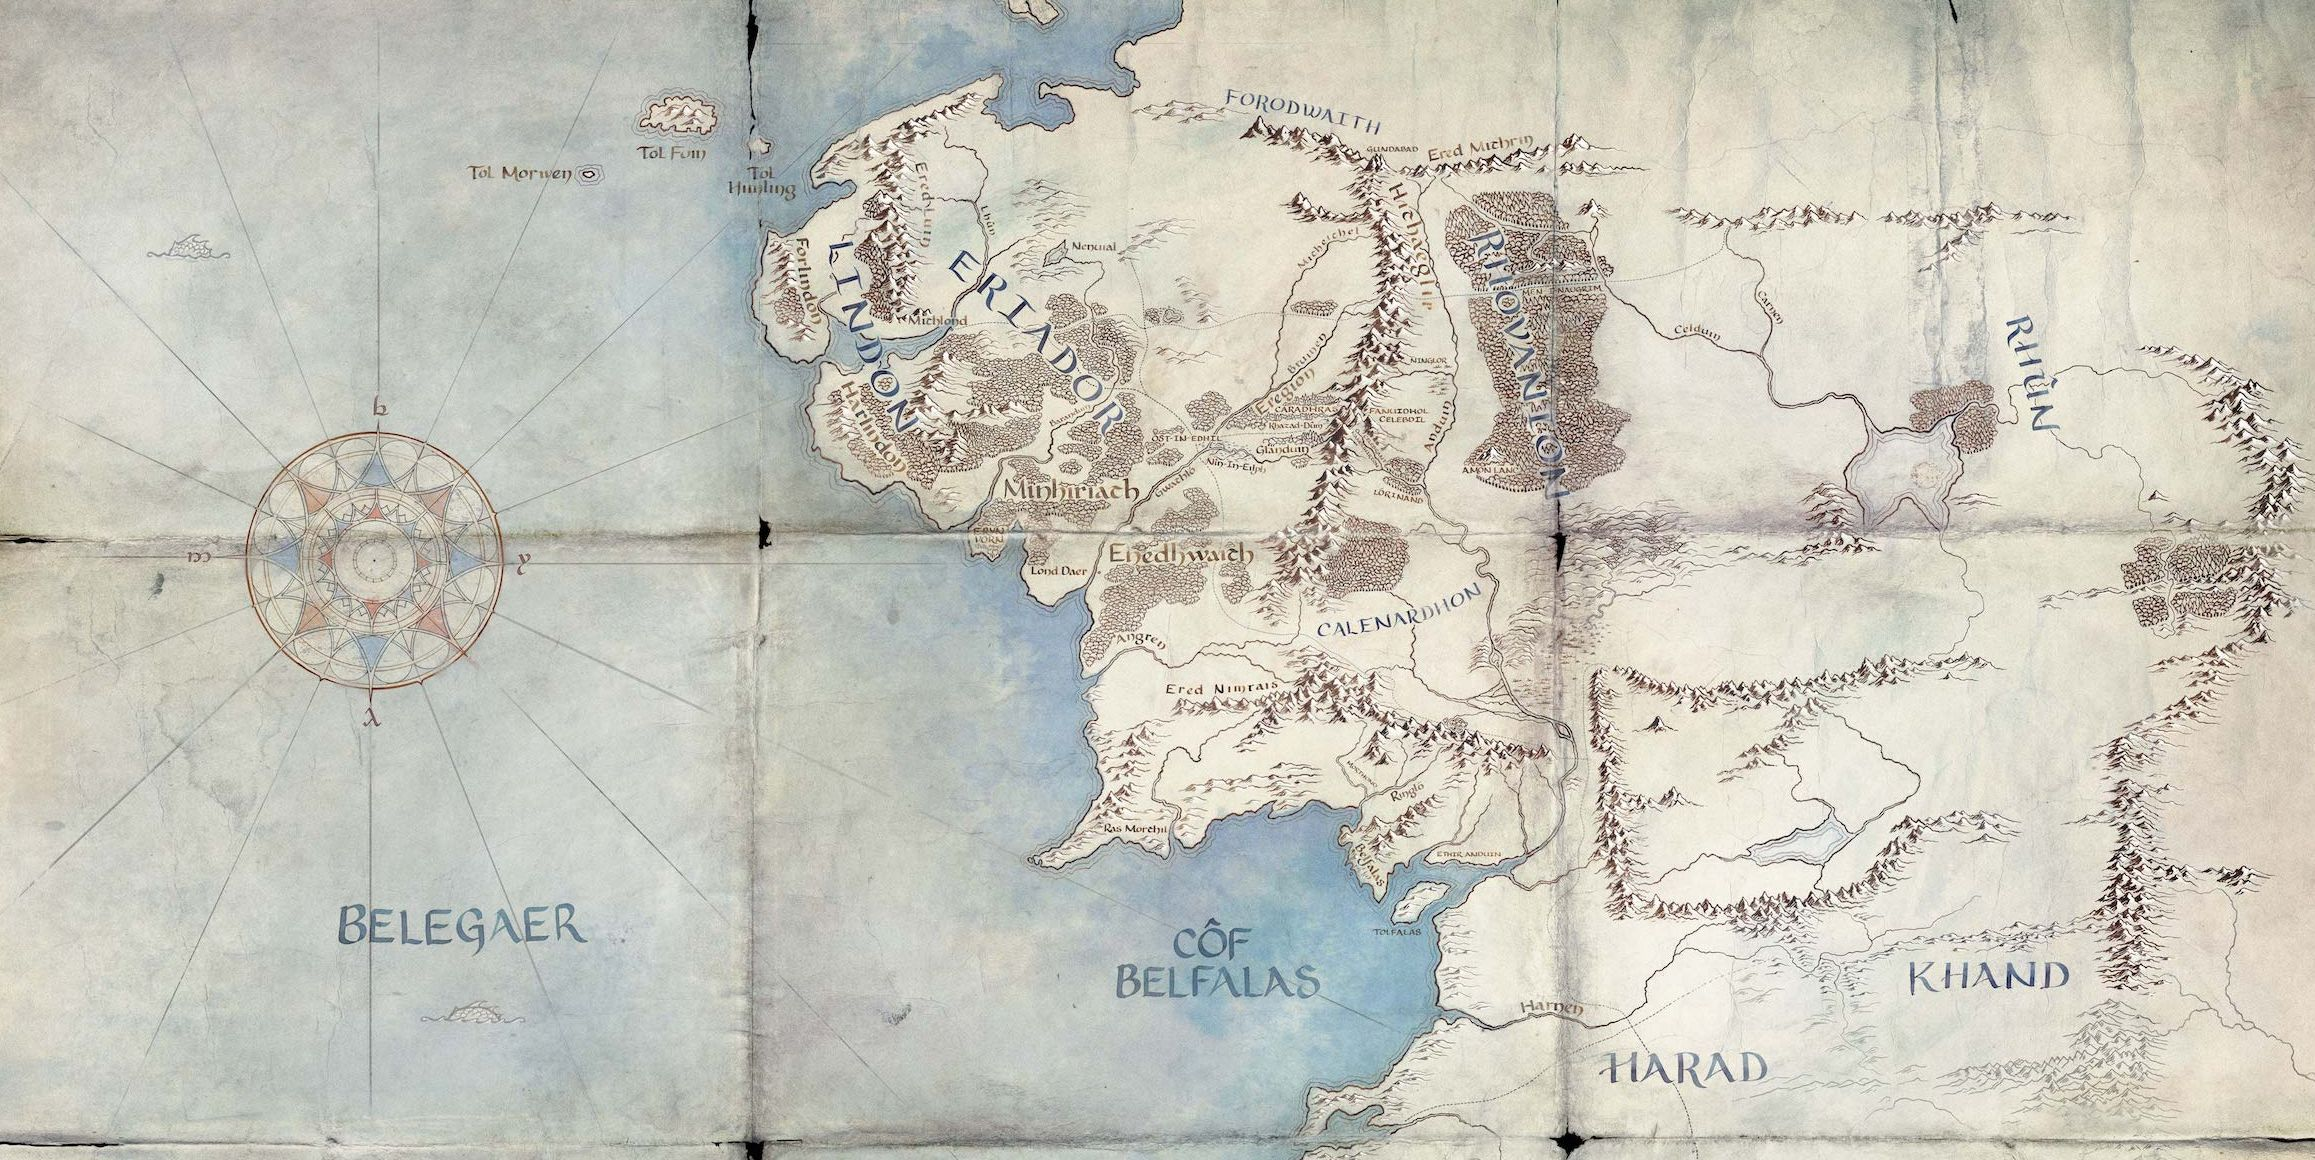 Mapa Tierra Media numenor